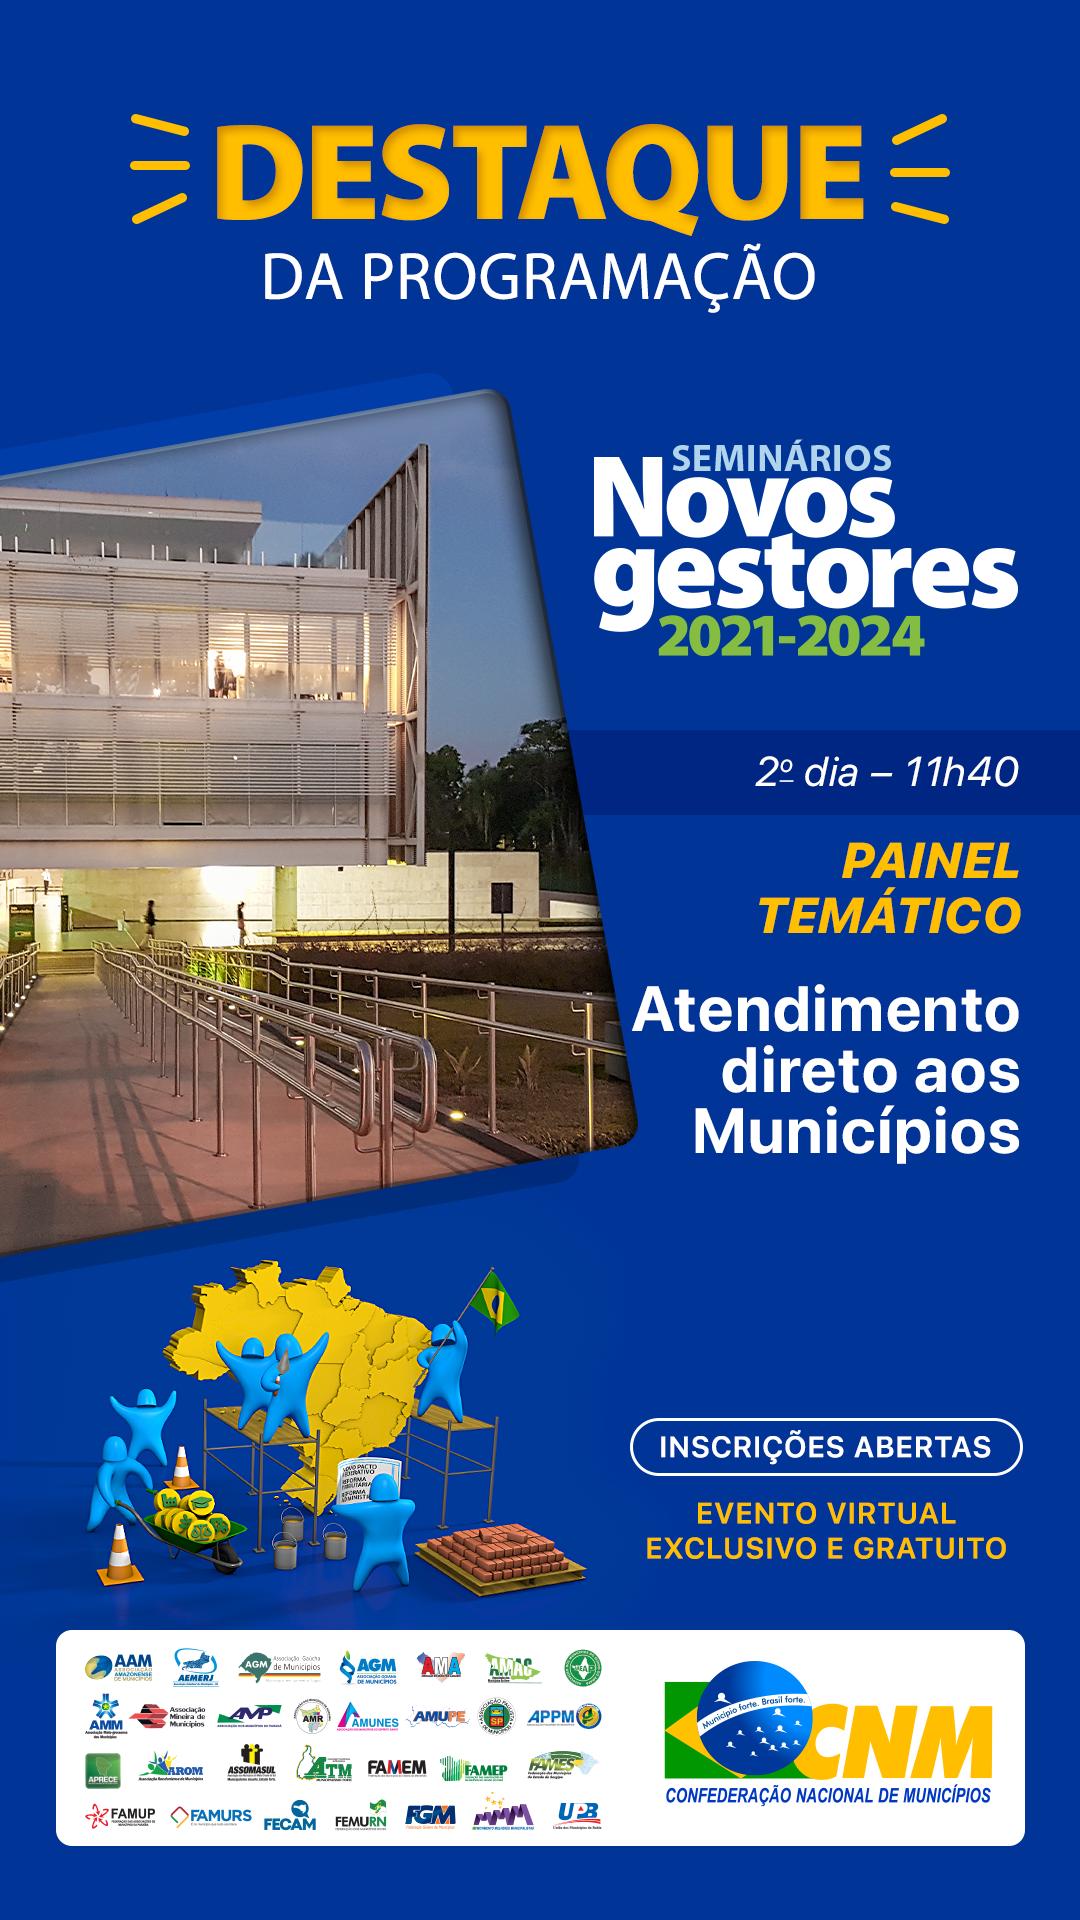 Seminário Novos Gestores 2021-2024